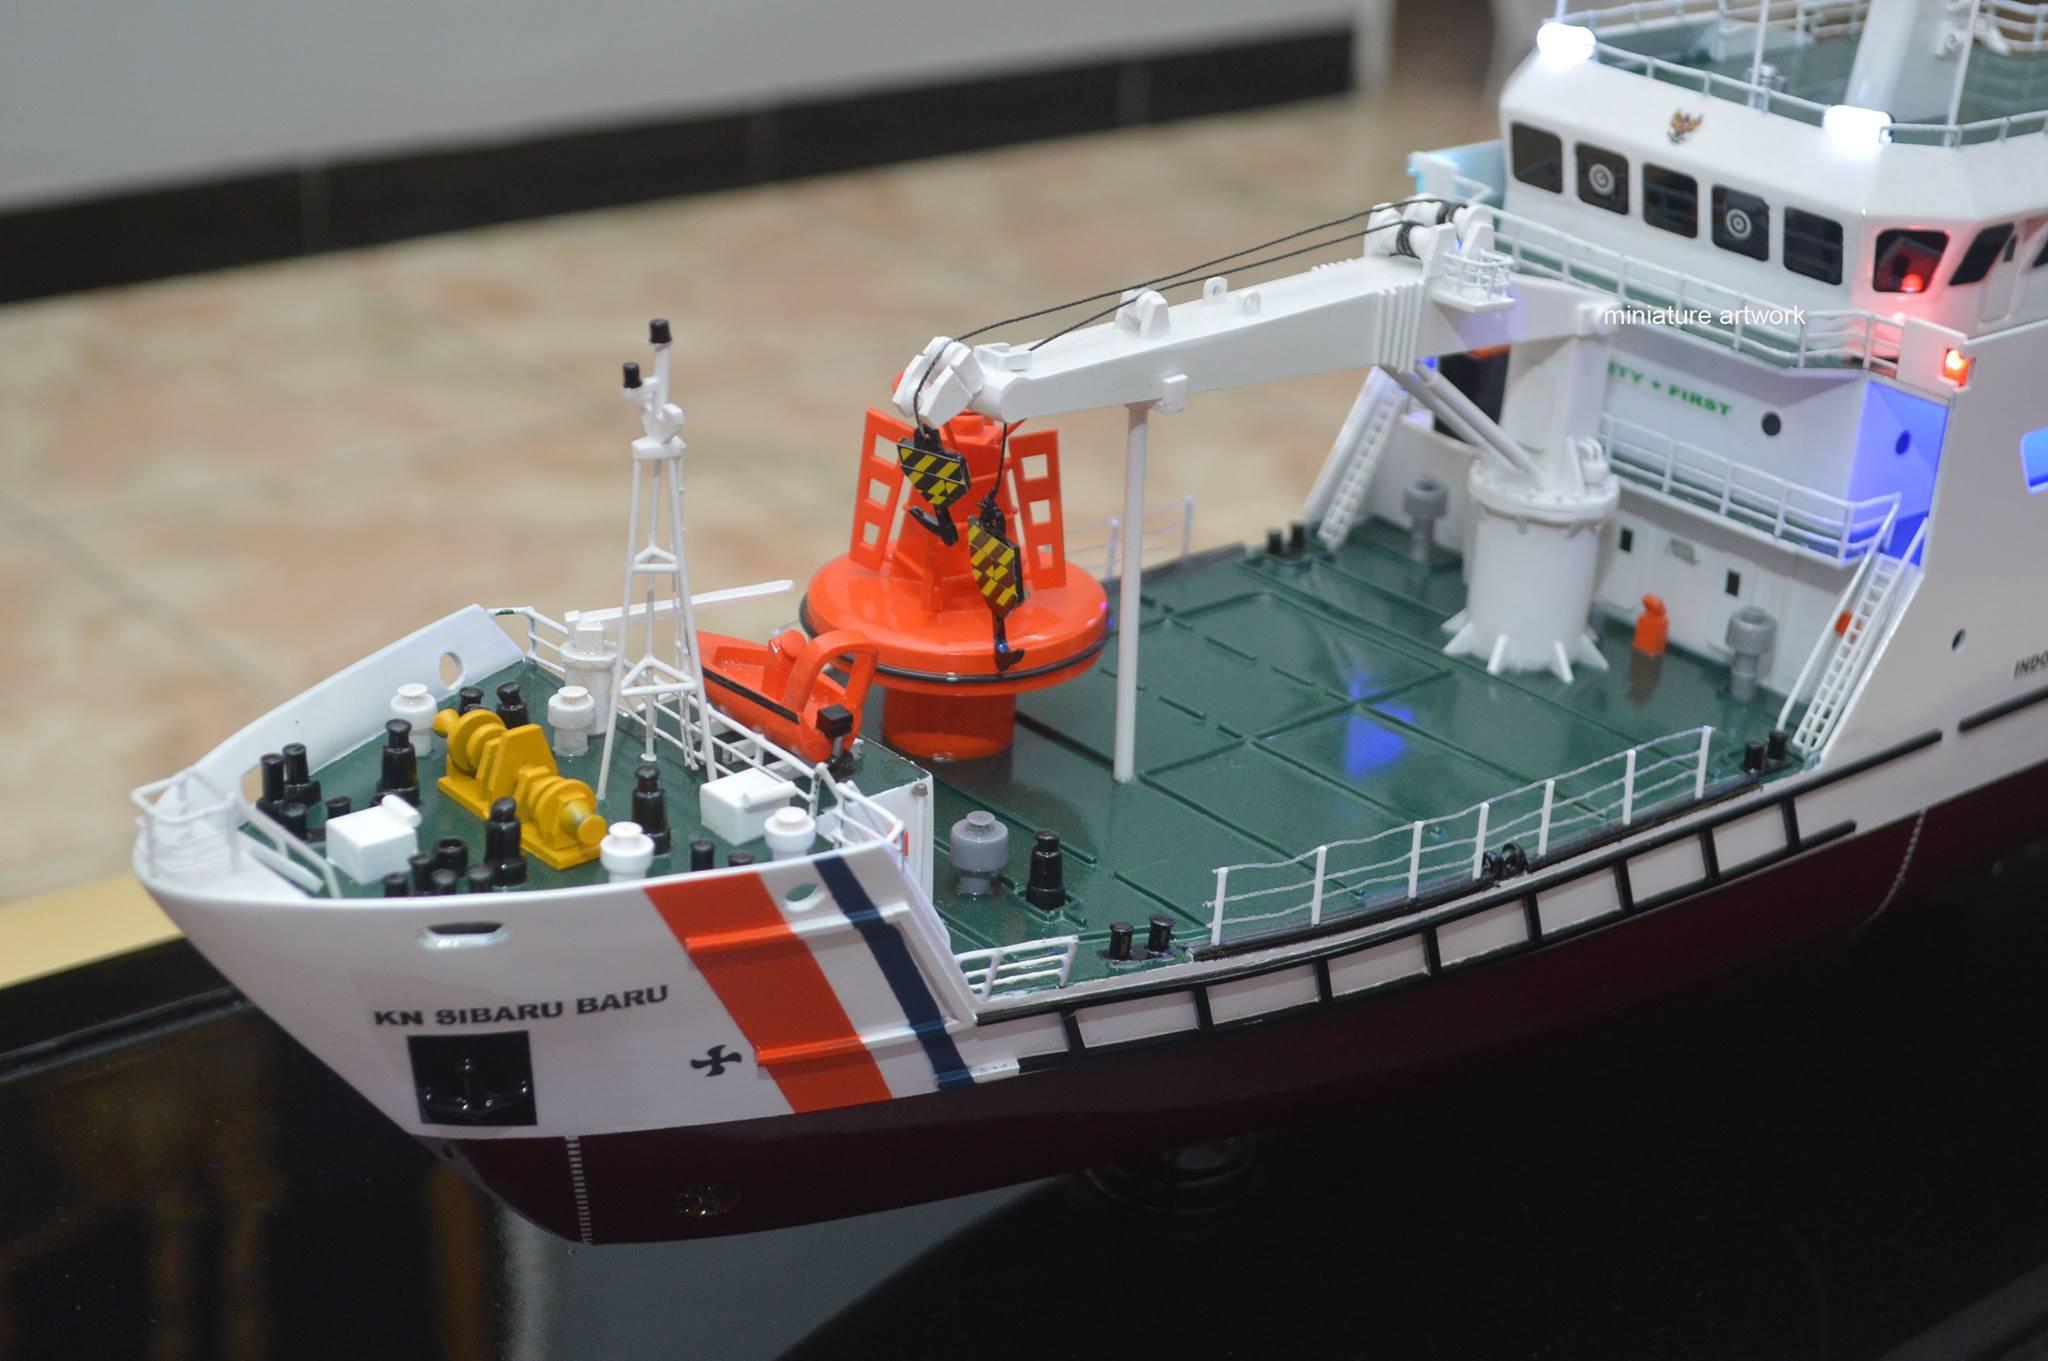 desain sketsa miniatur kapal kn sibaru baru navigation ship terbaik